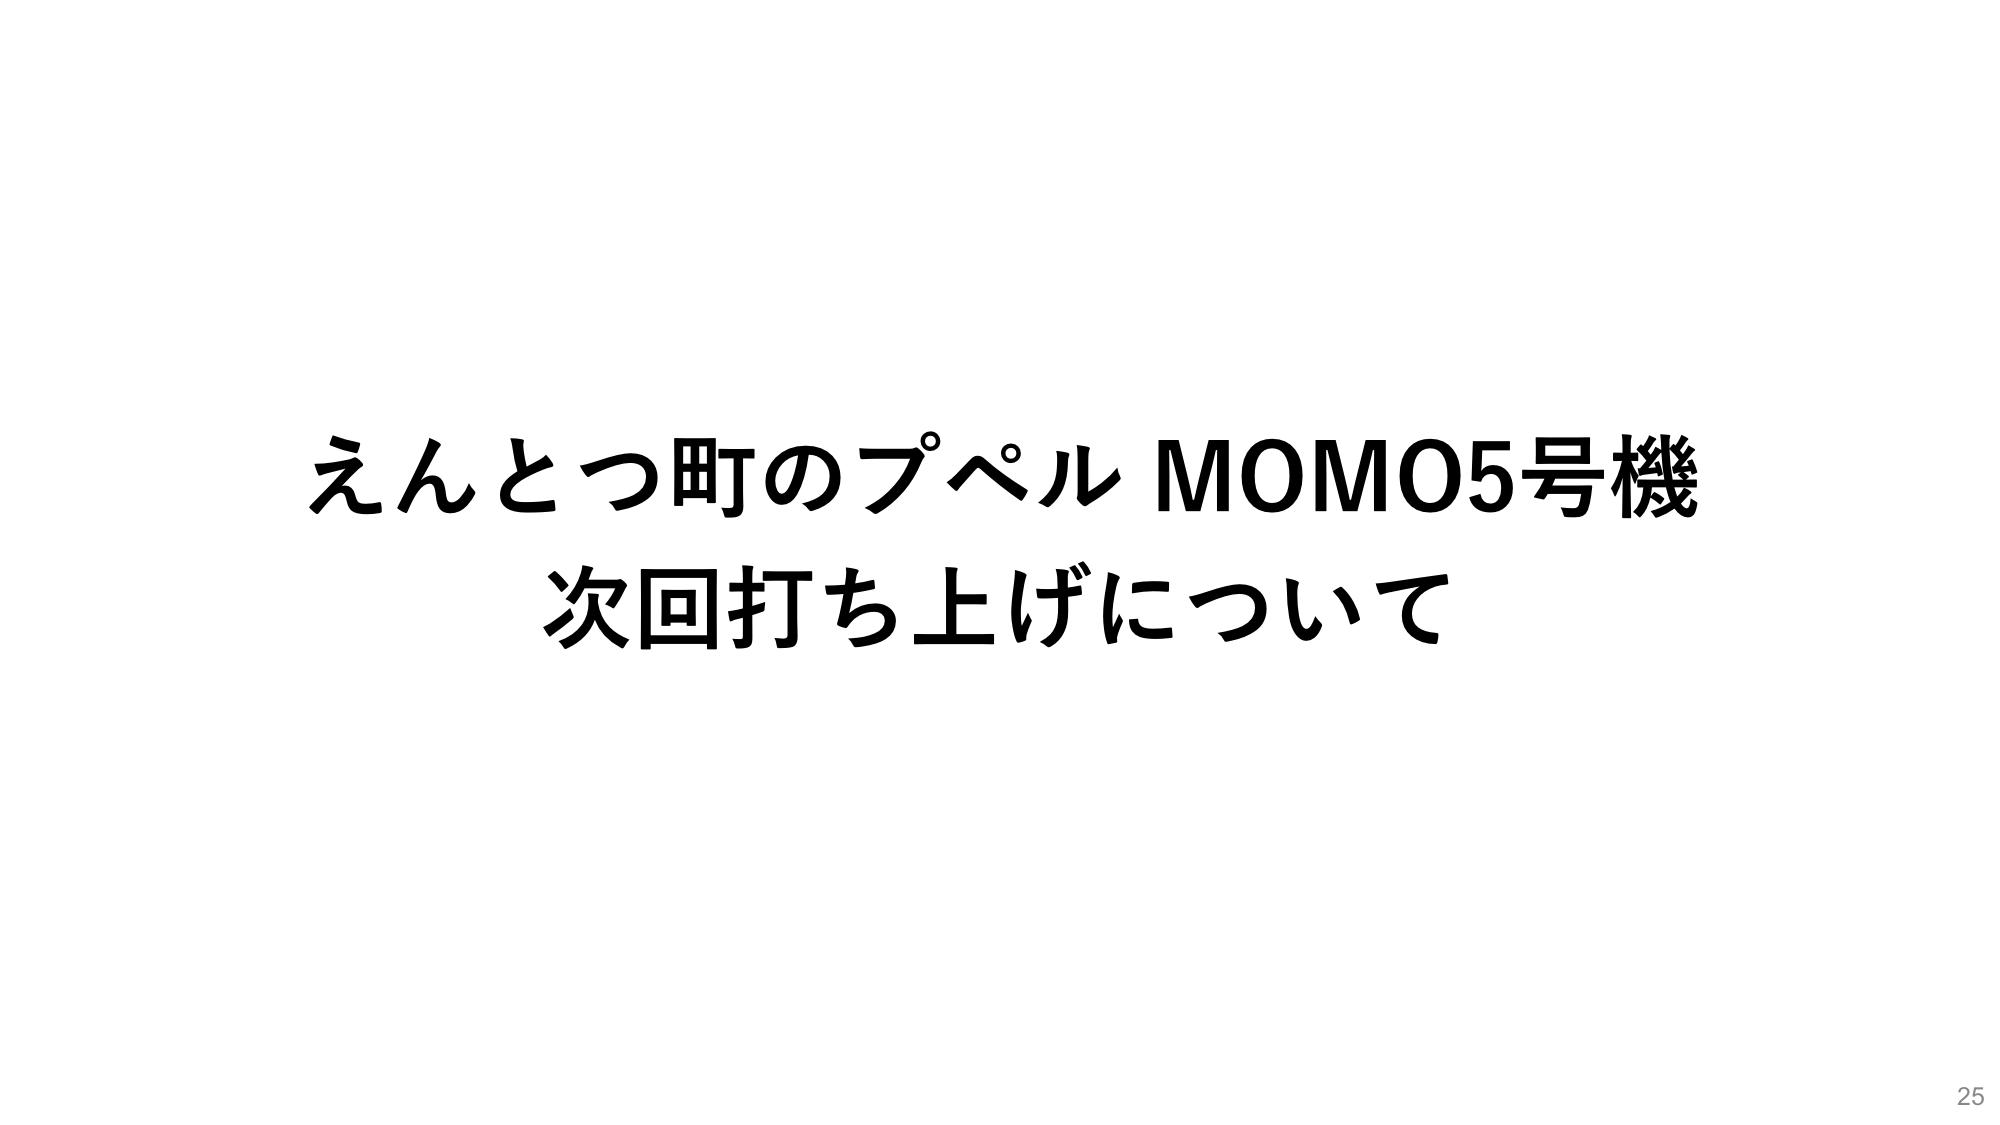 f:id:Imamura:20200603232946p:plain